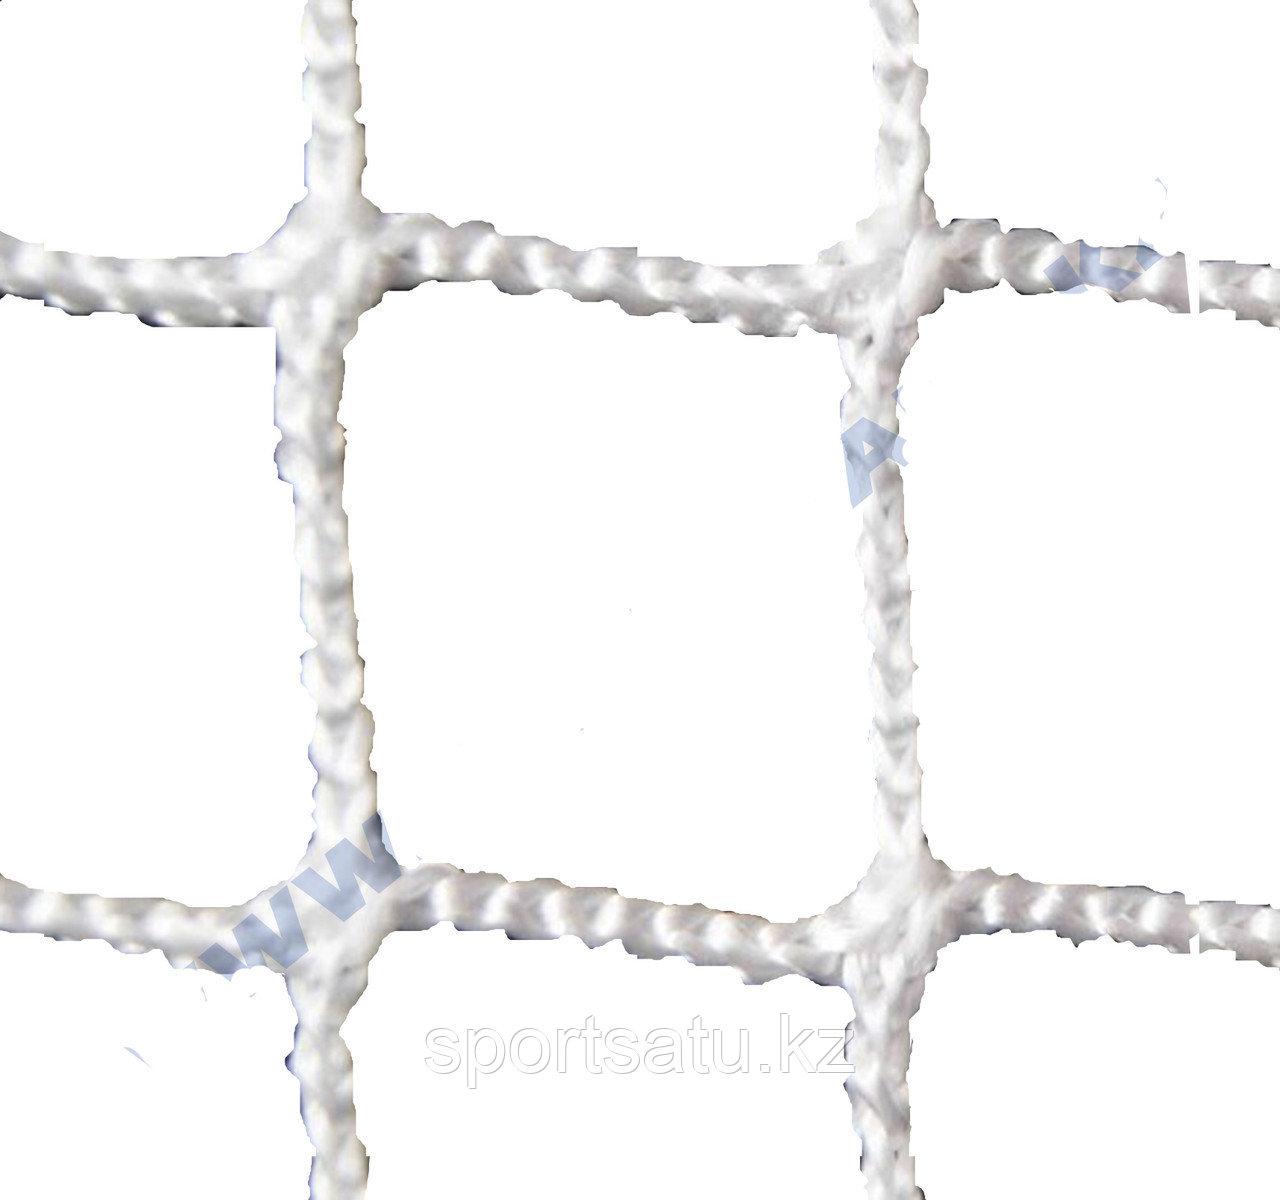 Сетка заградительная 40х40х3 белый/зеленый